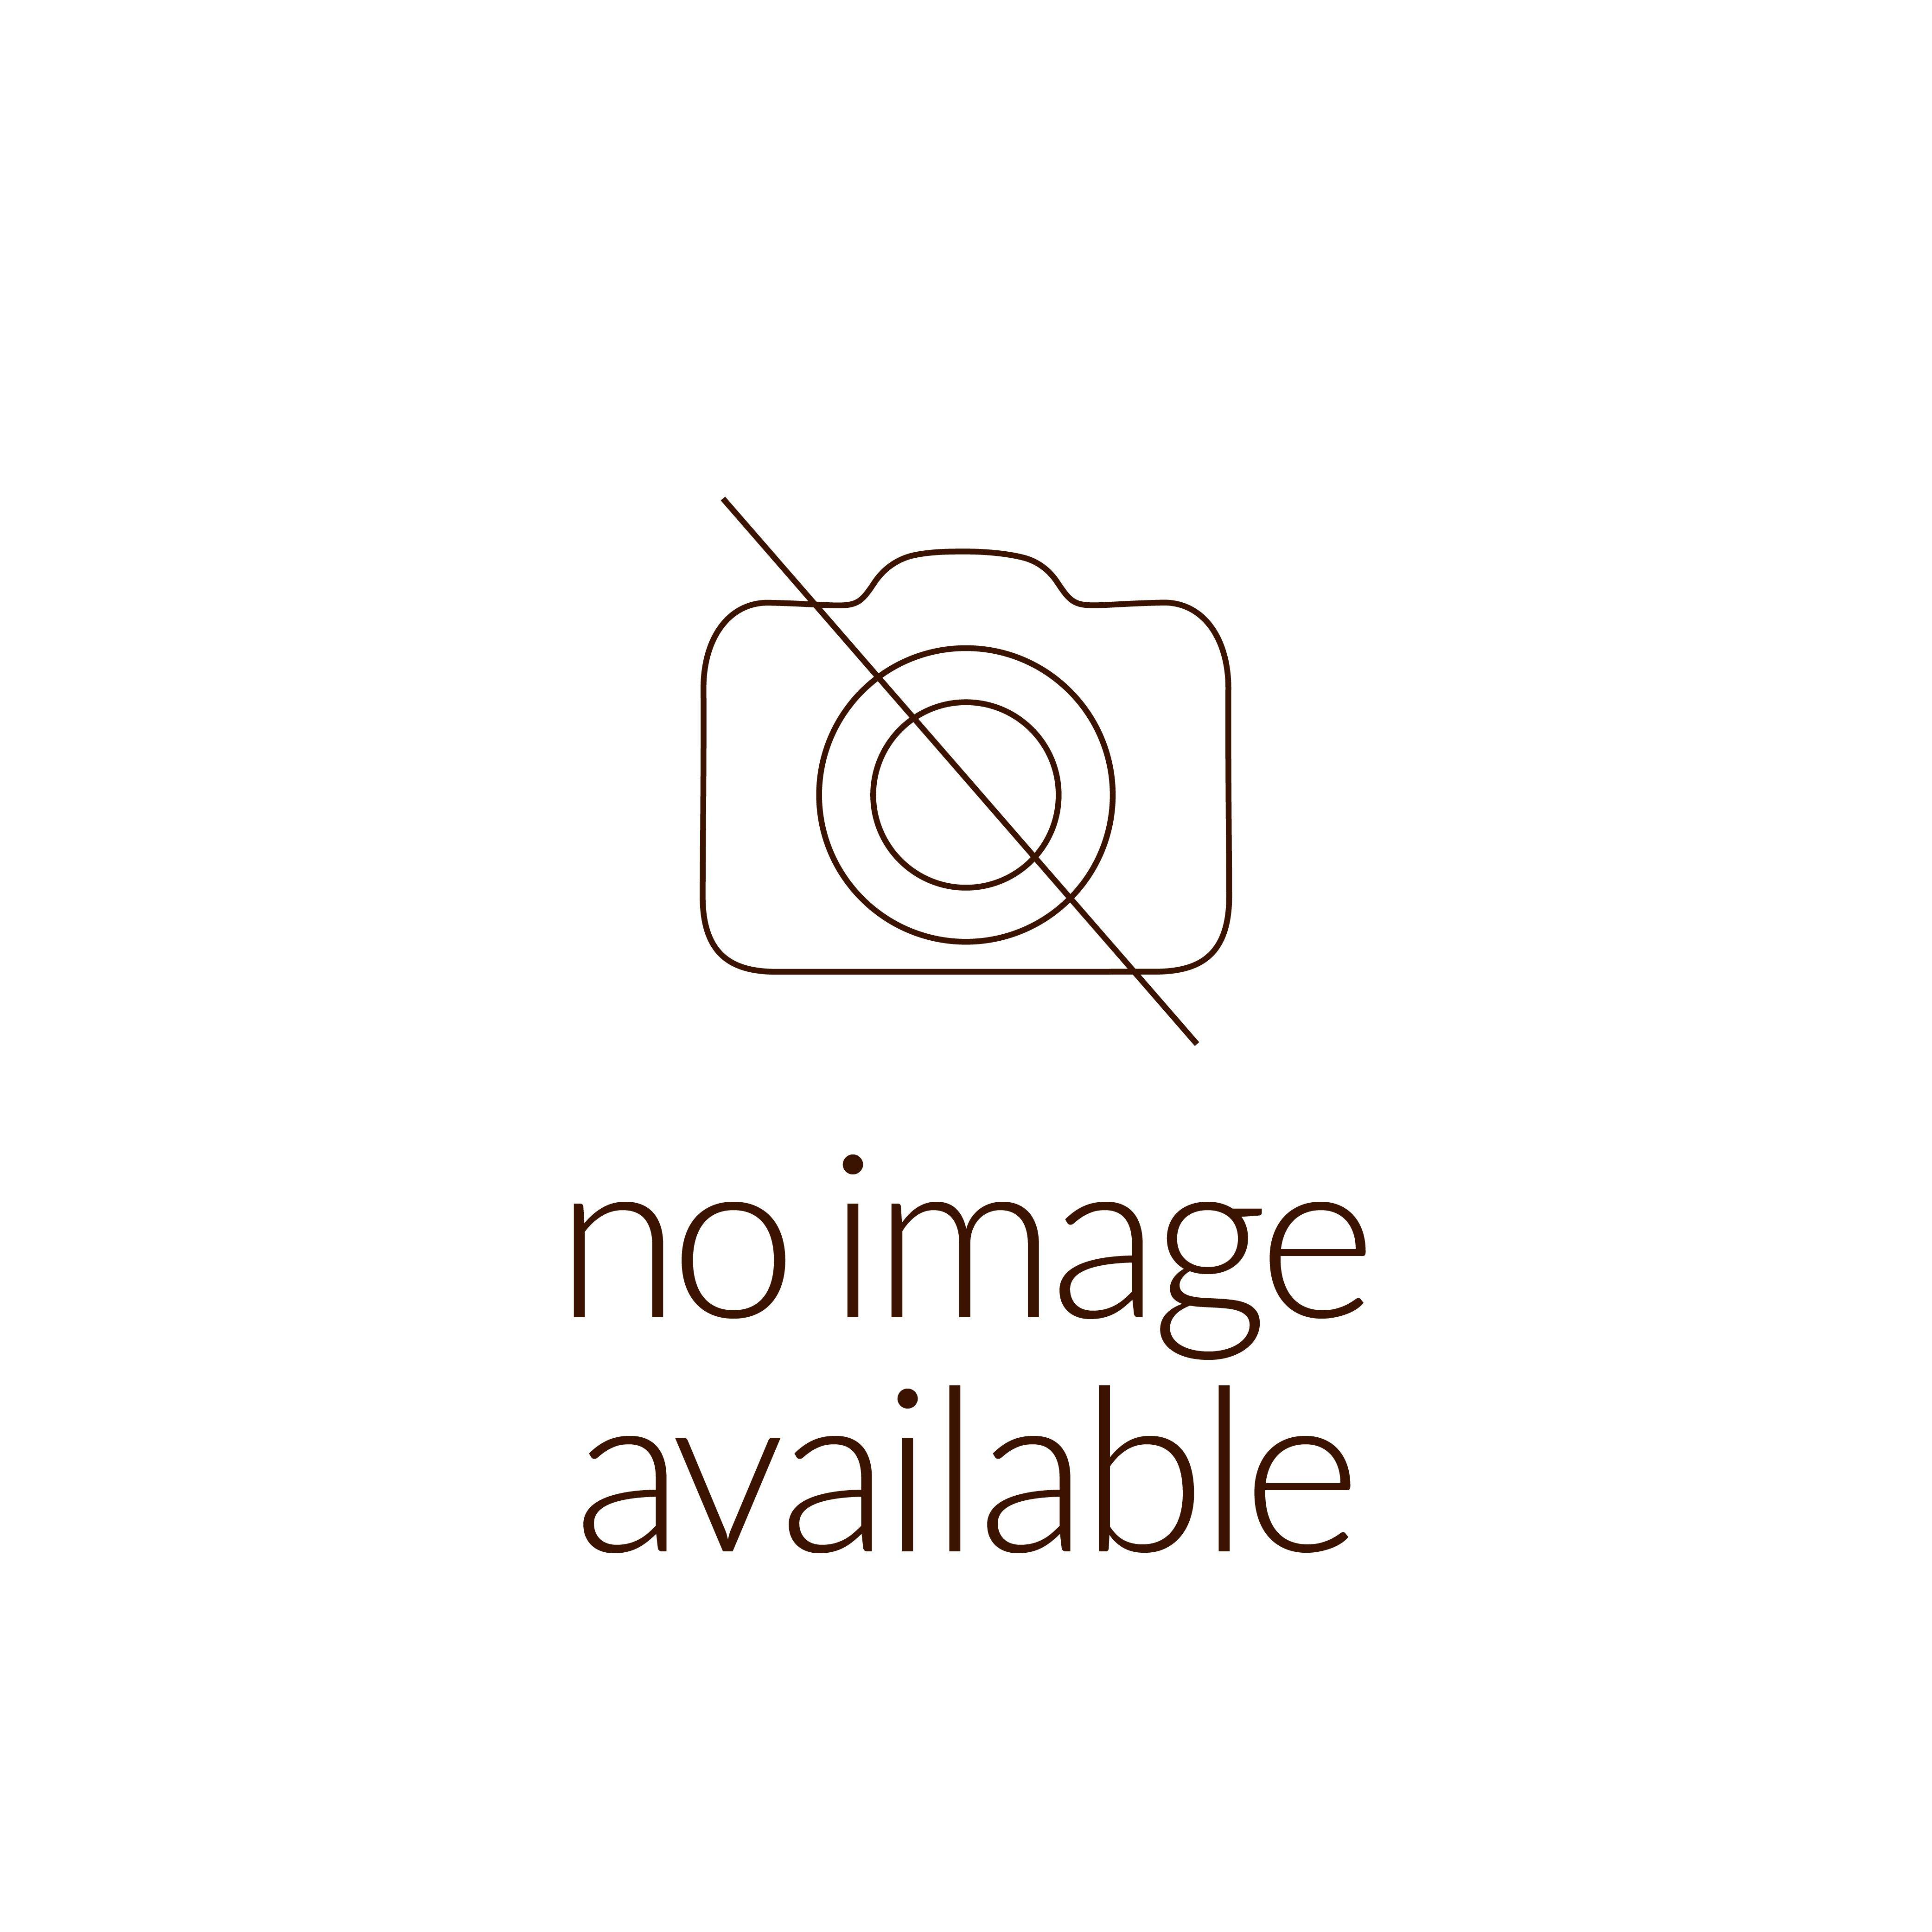 Invalids Olympics - 45.0 mm, 40 g, Bronze Tombac